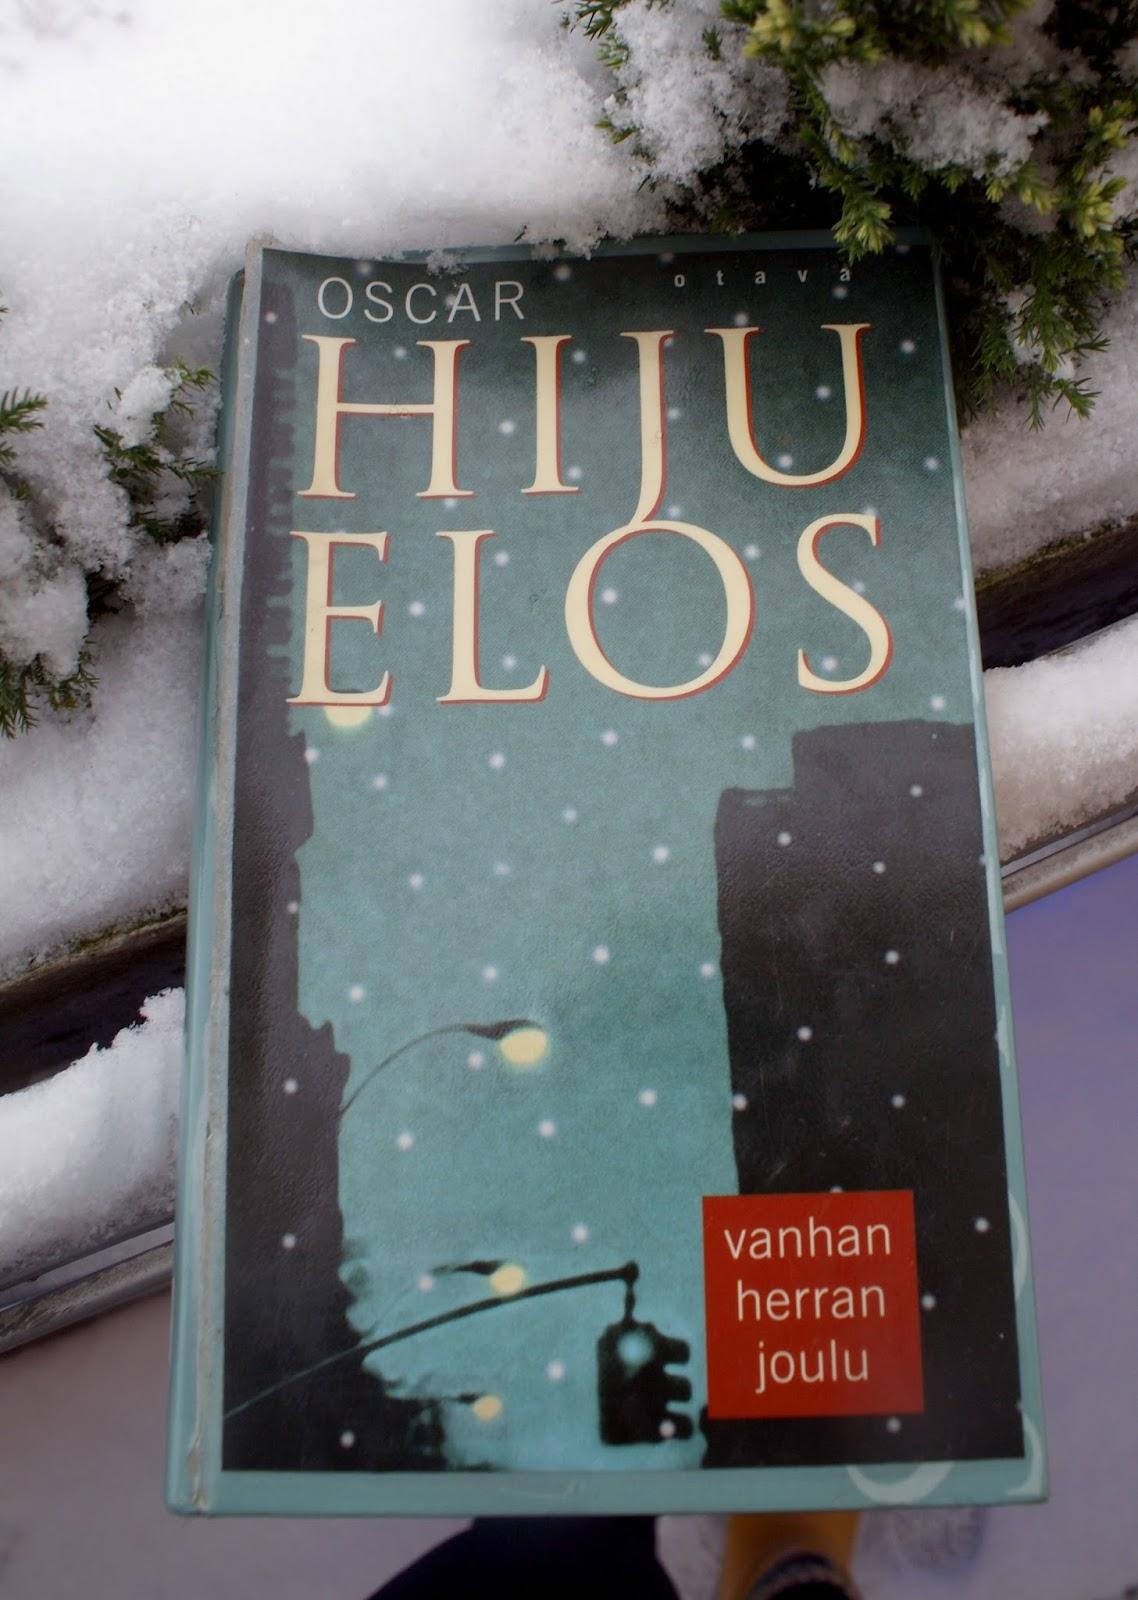 vanhan joulu 2018 Ex libris: Oscar Hijuelos: Vanhan herran joulu vanhan joulu 2018